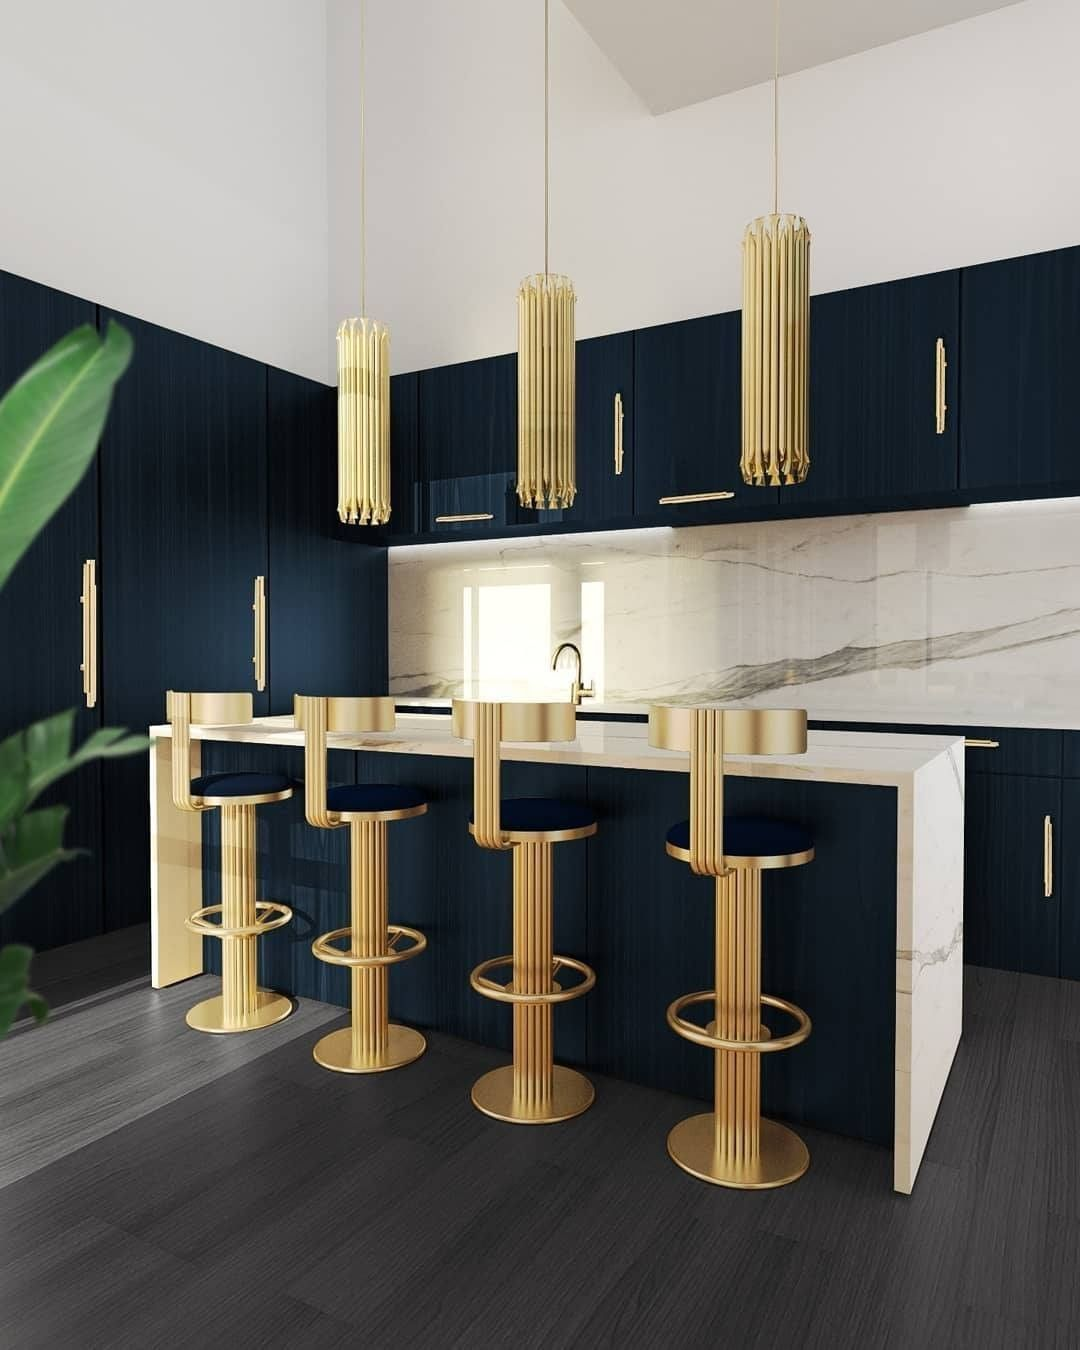 kitchen decor ideas Modern Kitchen Decor Ideas For 2021 modern kitchen decor ideas for 2021 4